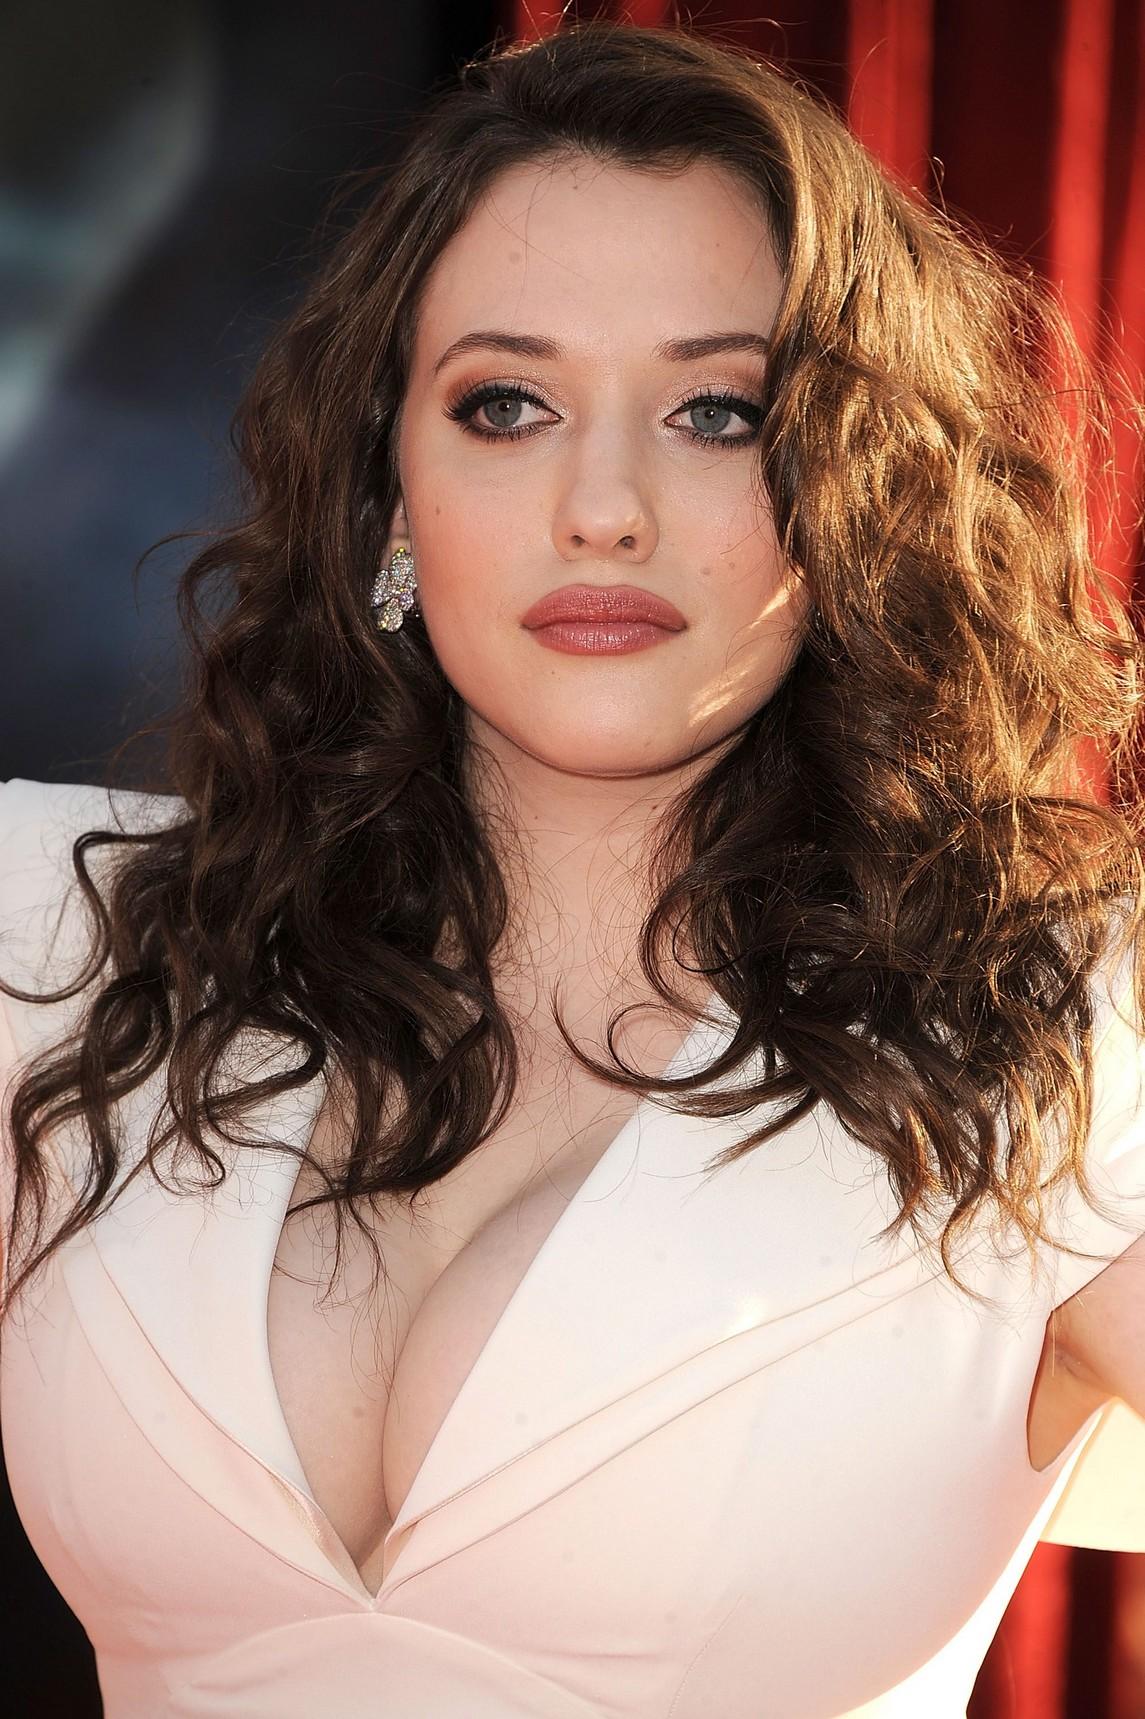 Kat Dennings Hot & Sexy Leaked Photos